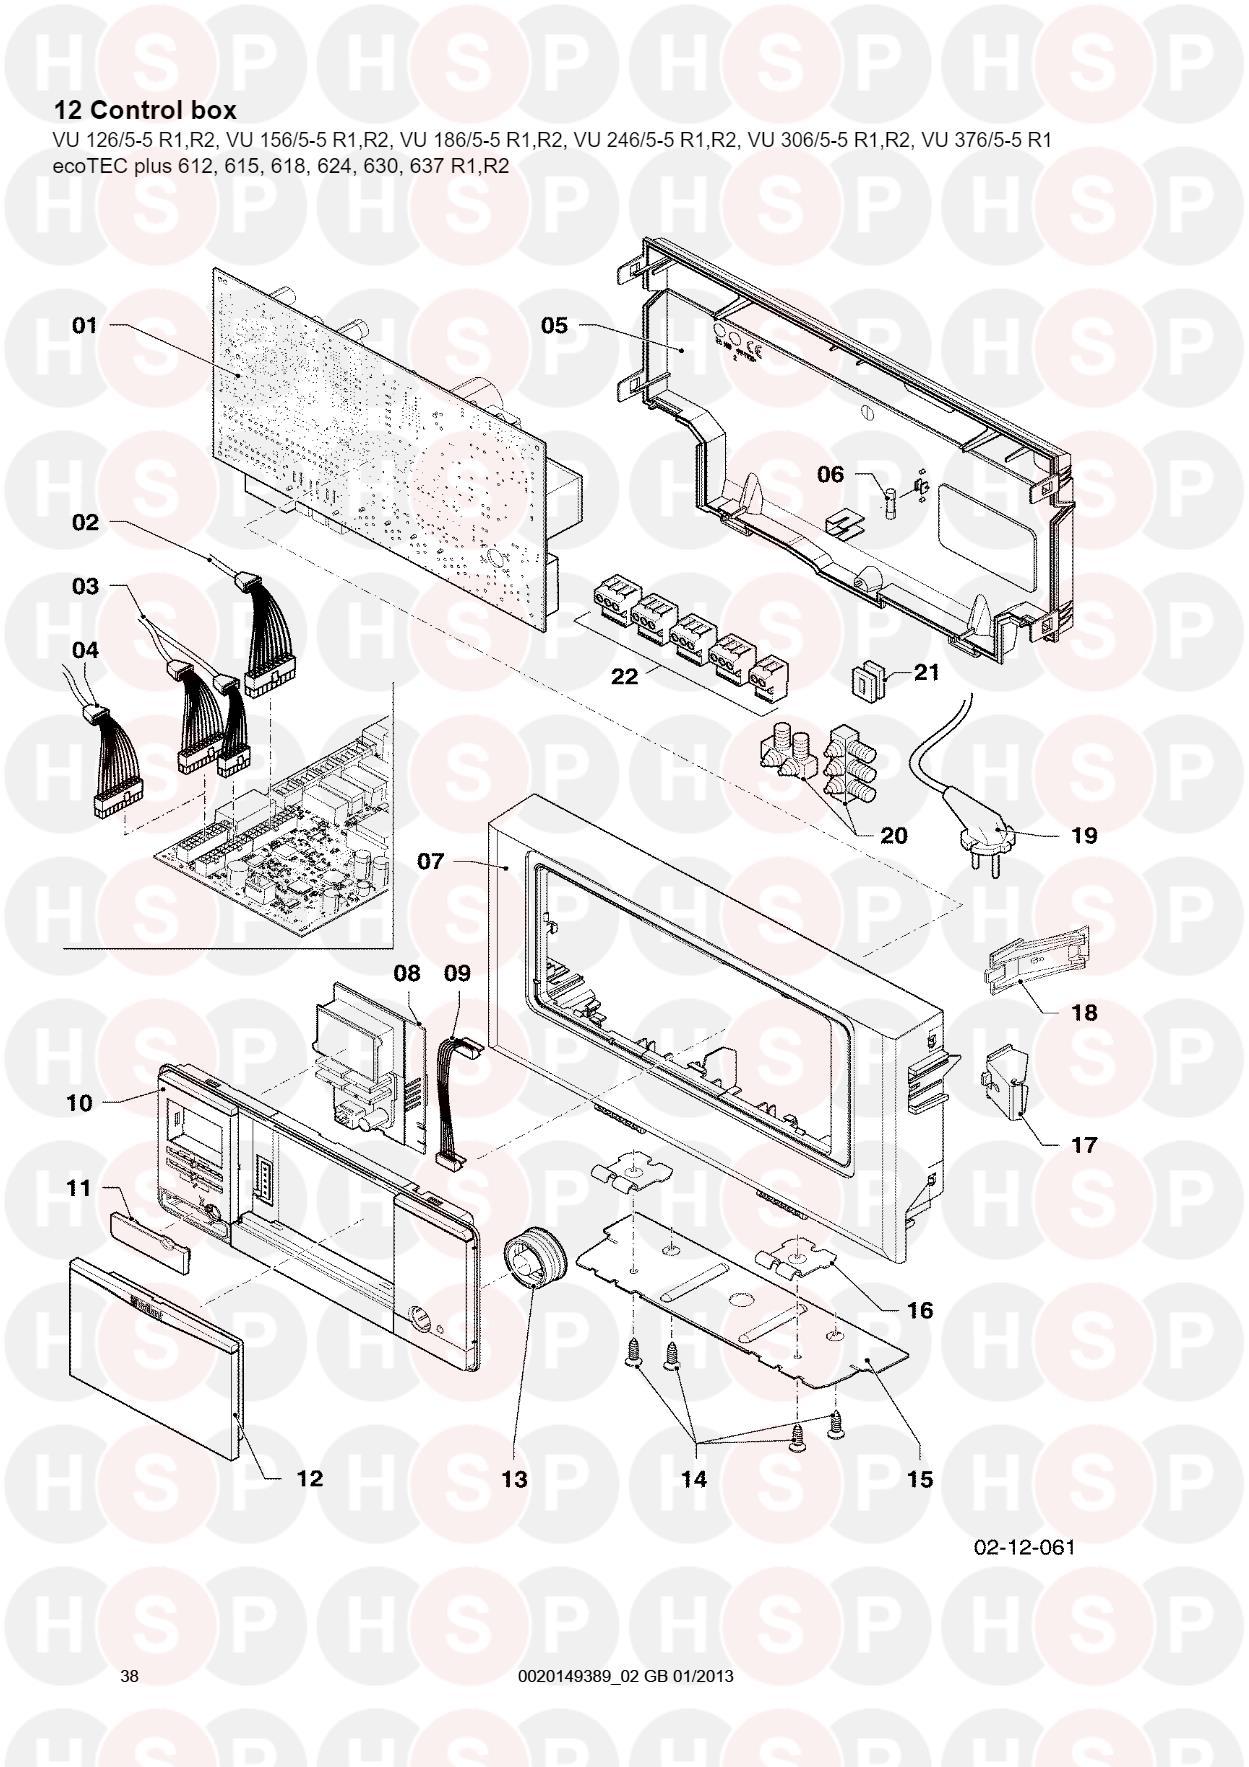 Vaillant ecotec plus 612 615 618 624 630 637 12 control box 12 control box sheet 2 diagram for vaillant ecotec plus 612 615 618 asfbconference2016 Image collections